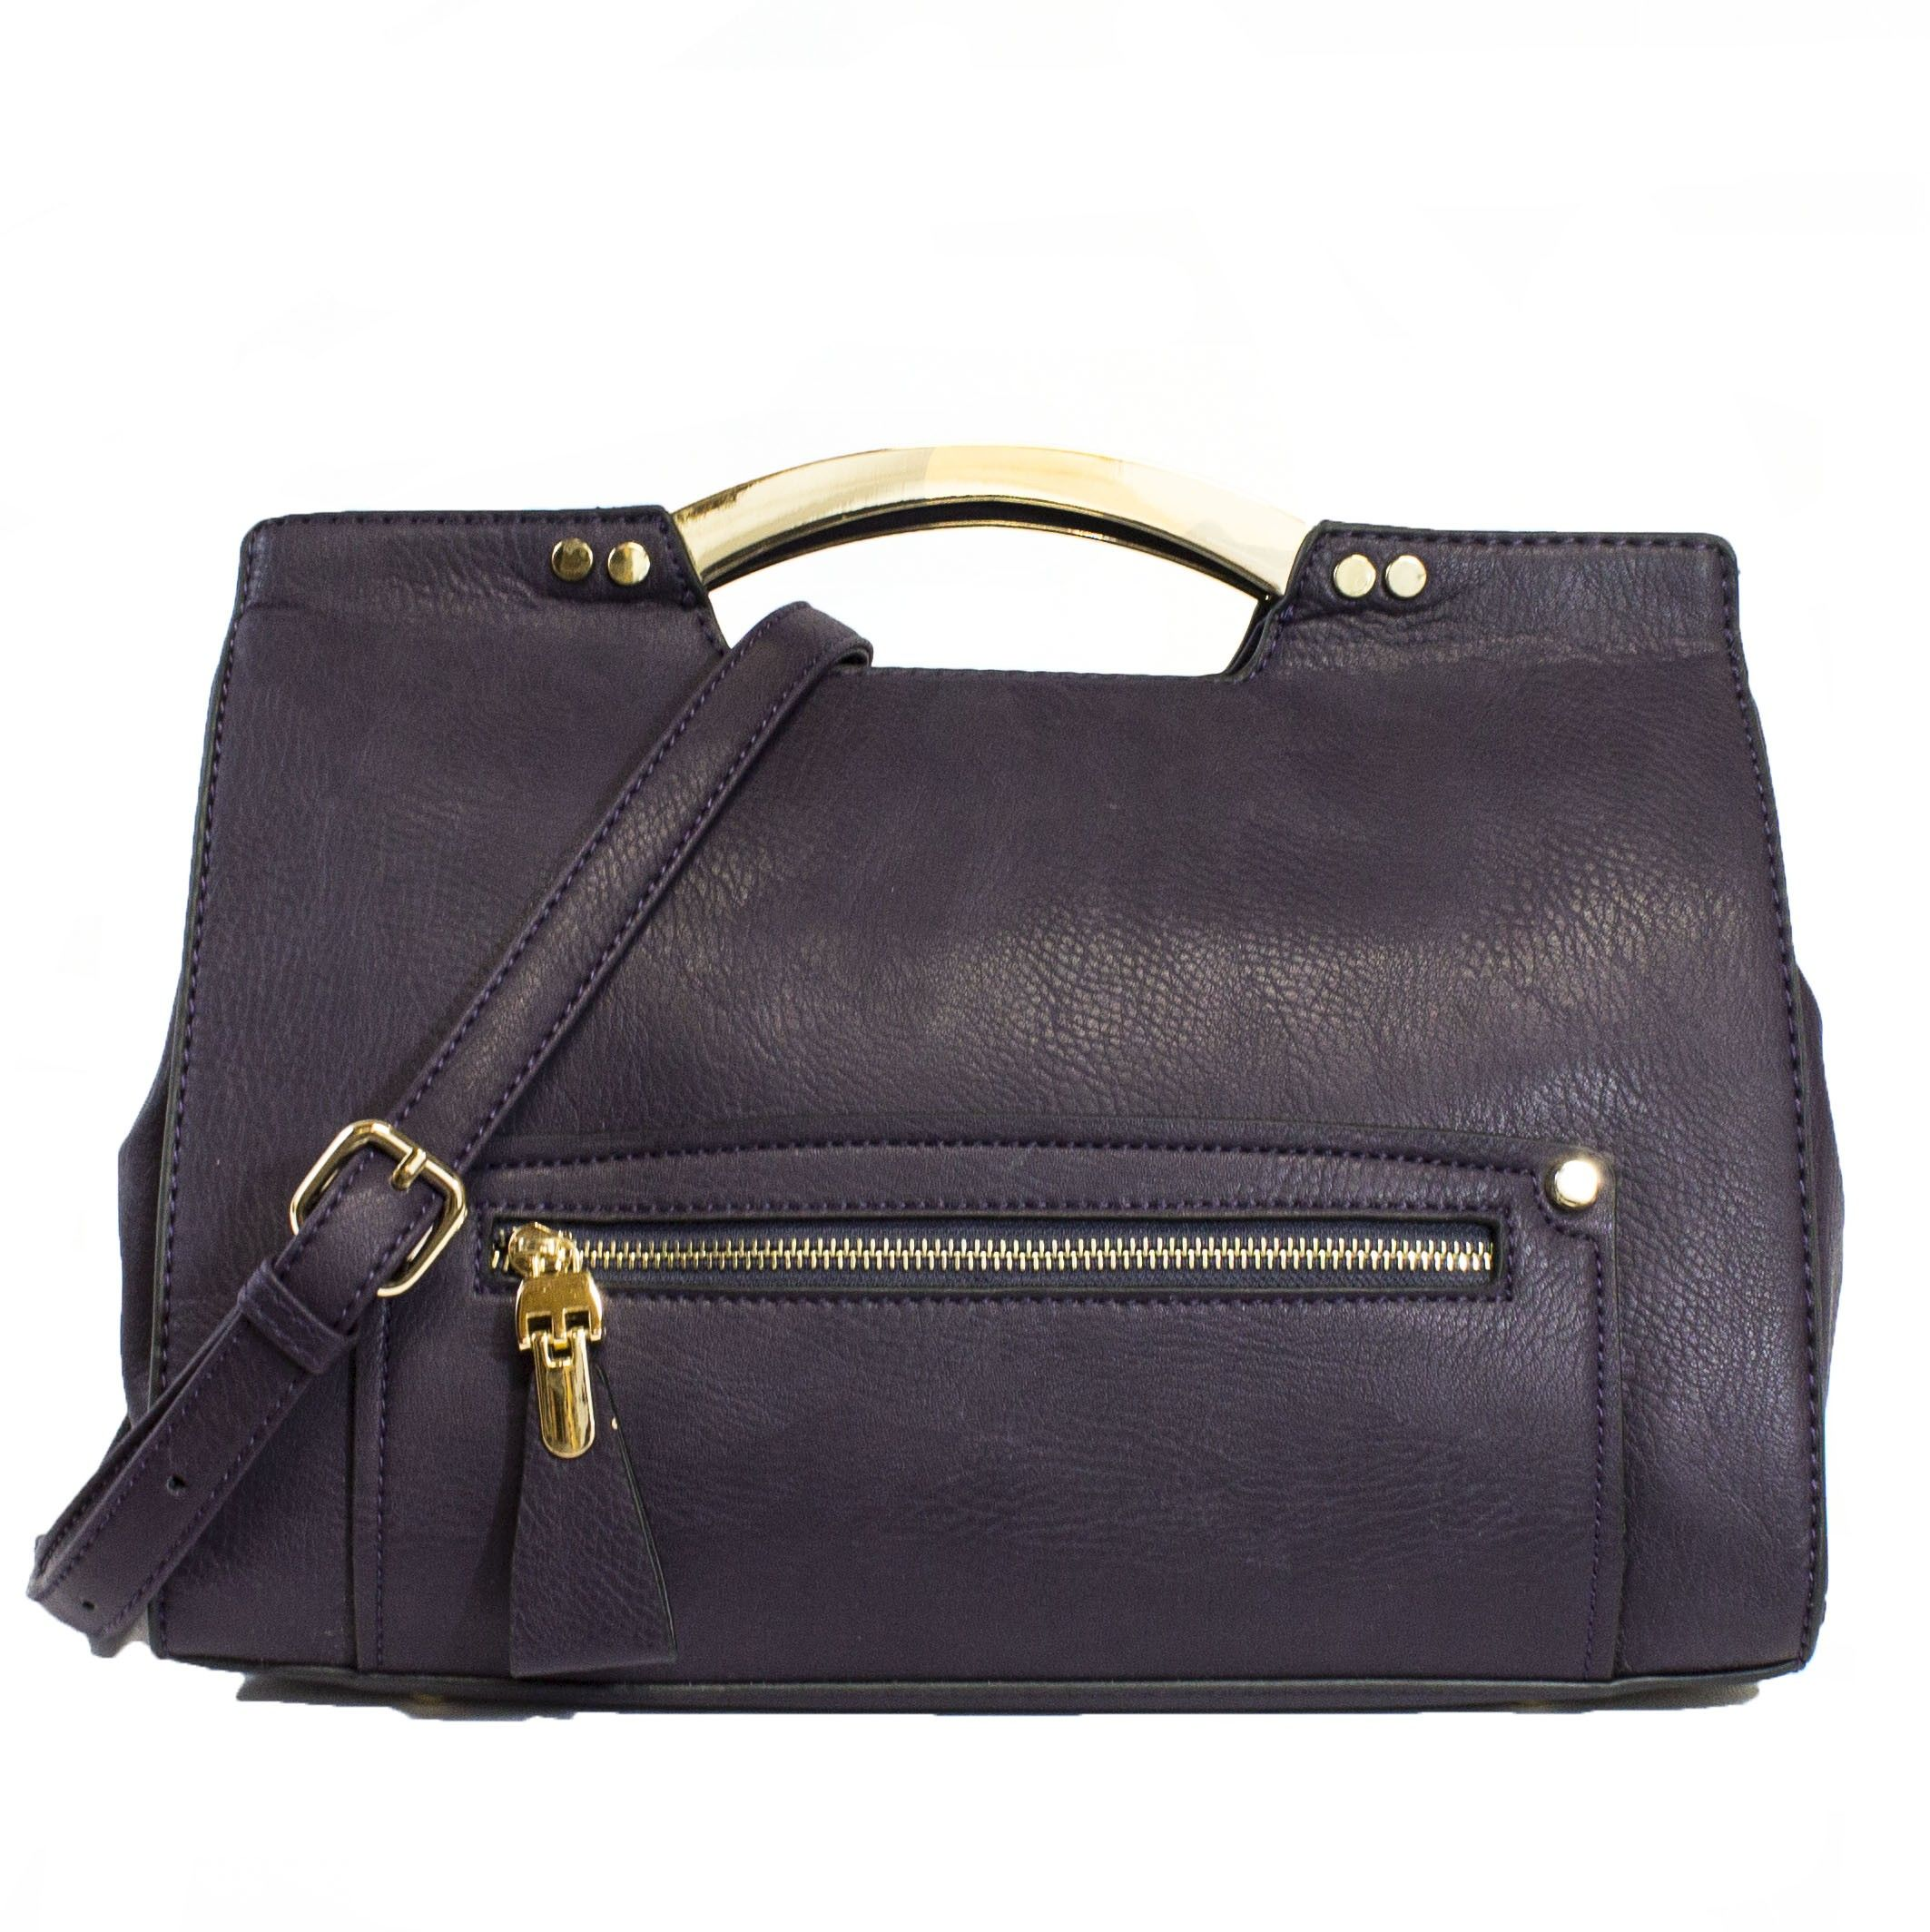 Birklie Structured Satchel Handbag In Purple Handbags Purses Heaven Handbagheaven